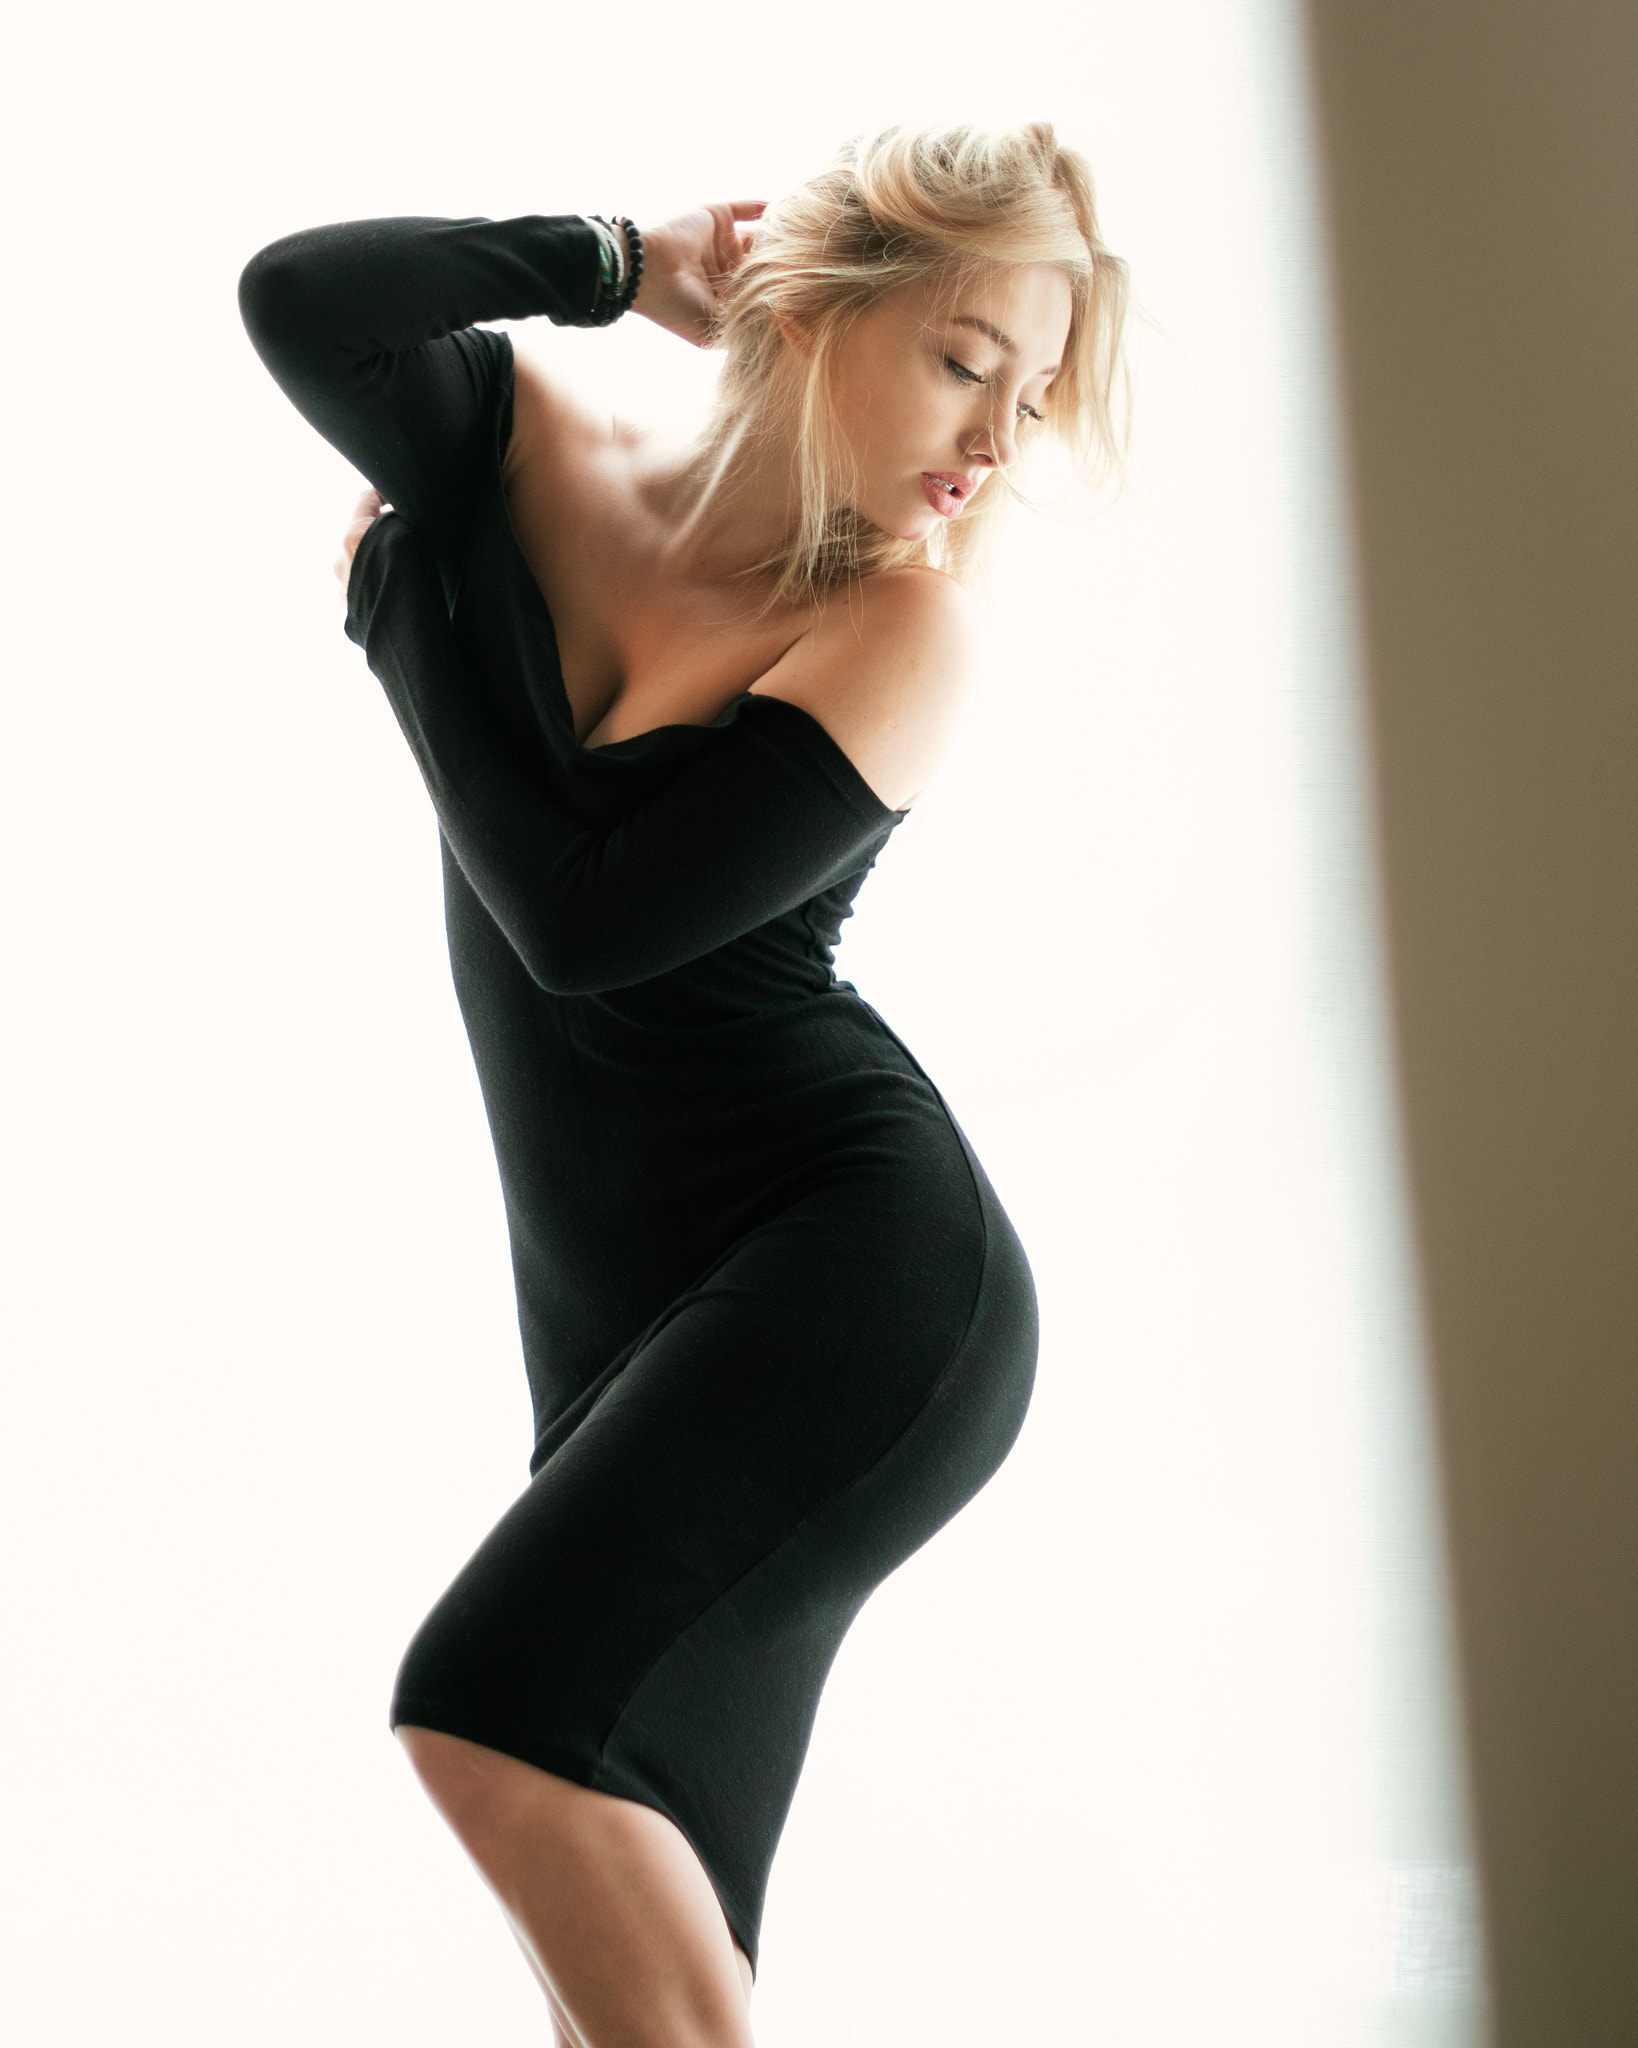 People 1638x2048 dress black dress women model blonde women indoors tight dress